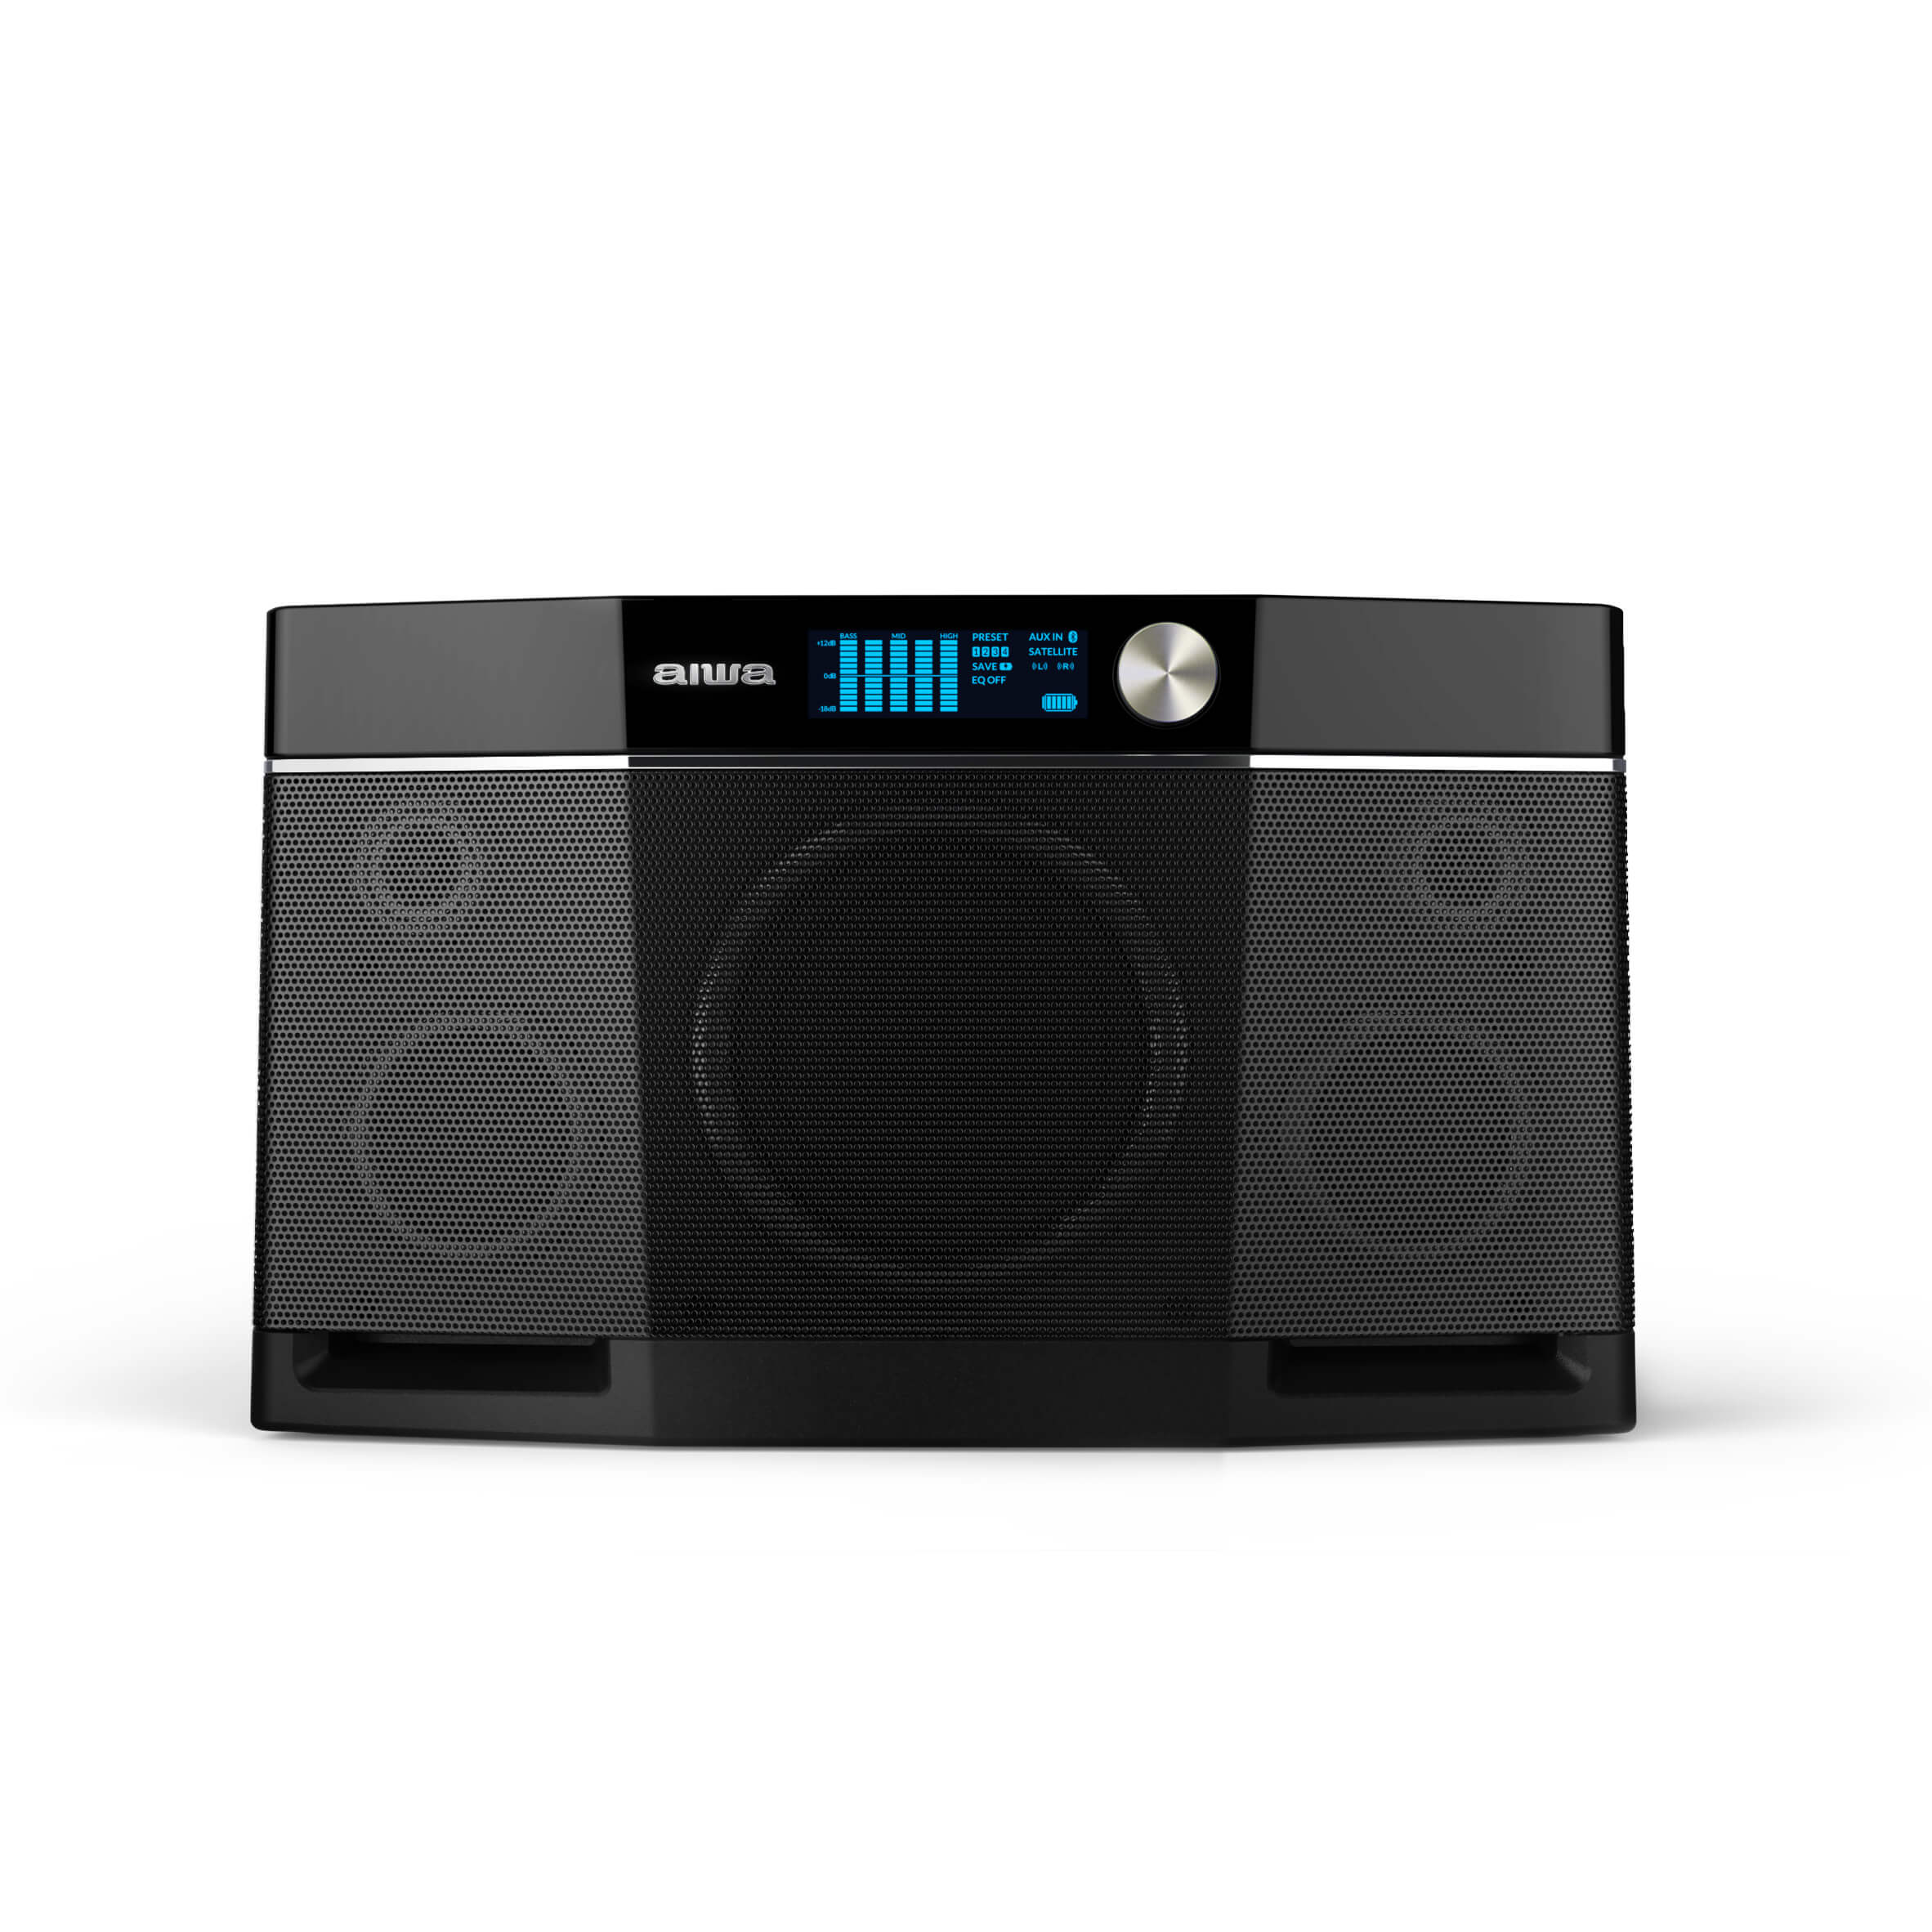 Infared Remote Control for Aiwa Exos 9 Wireless Bluetooth Speaker  BRAND NEW!